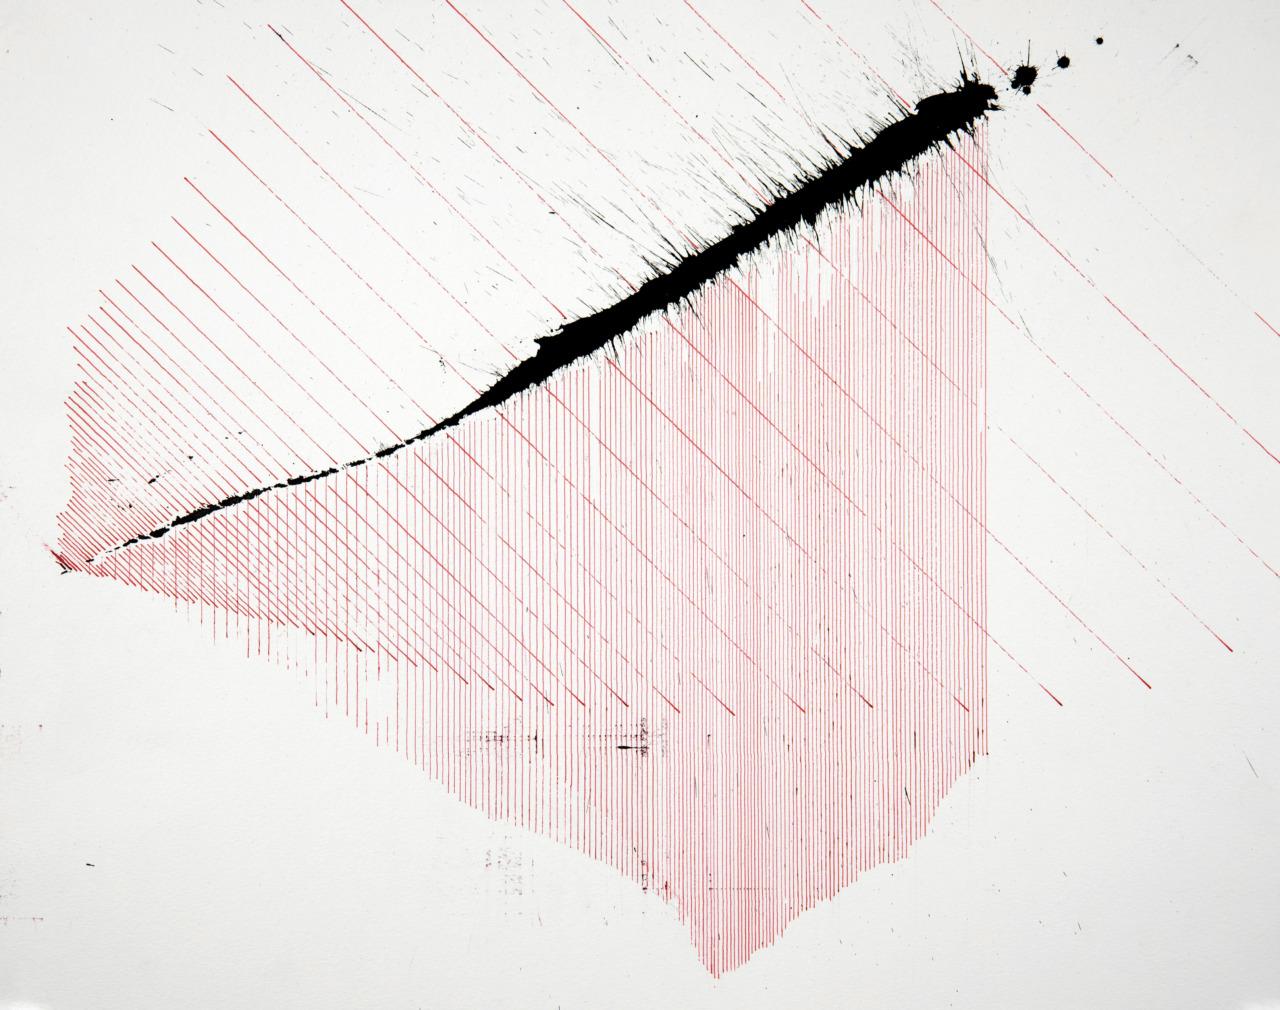 op160520. acrylic on paper, 40x50cm